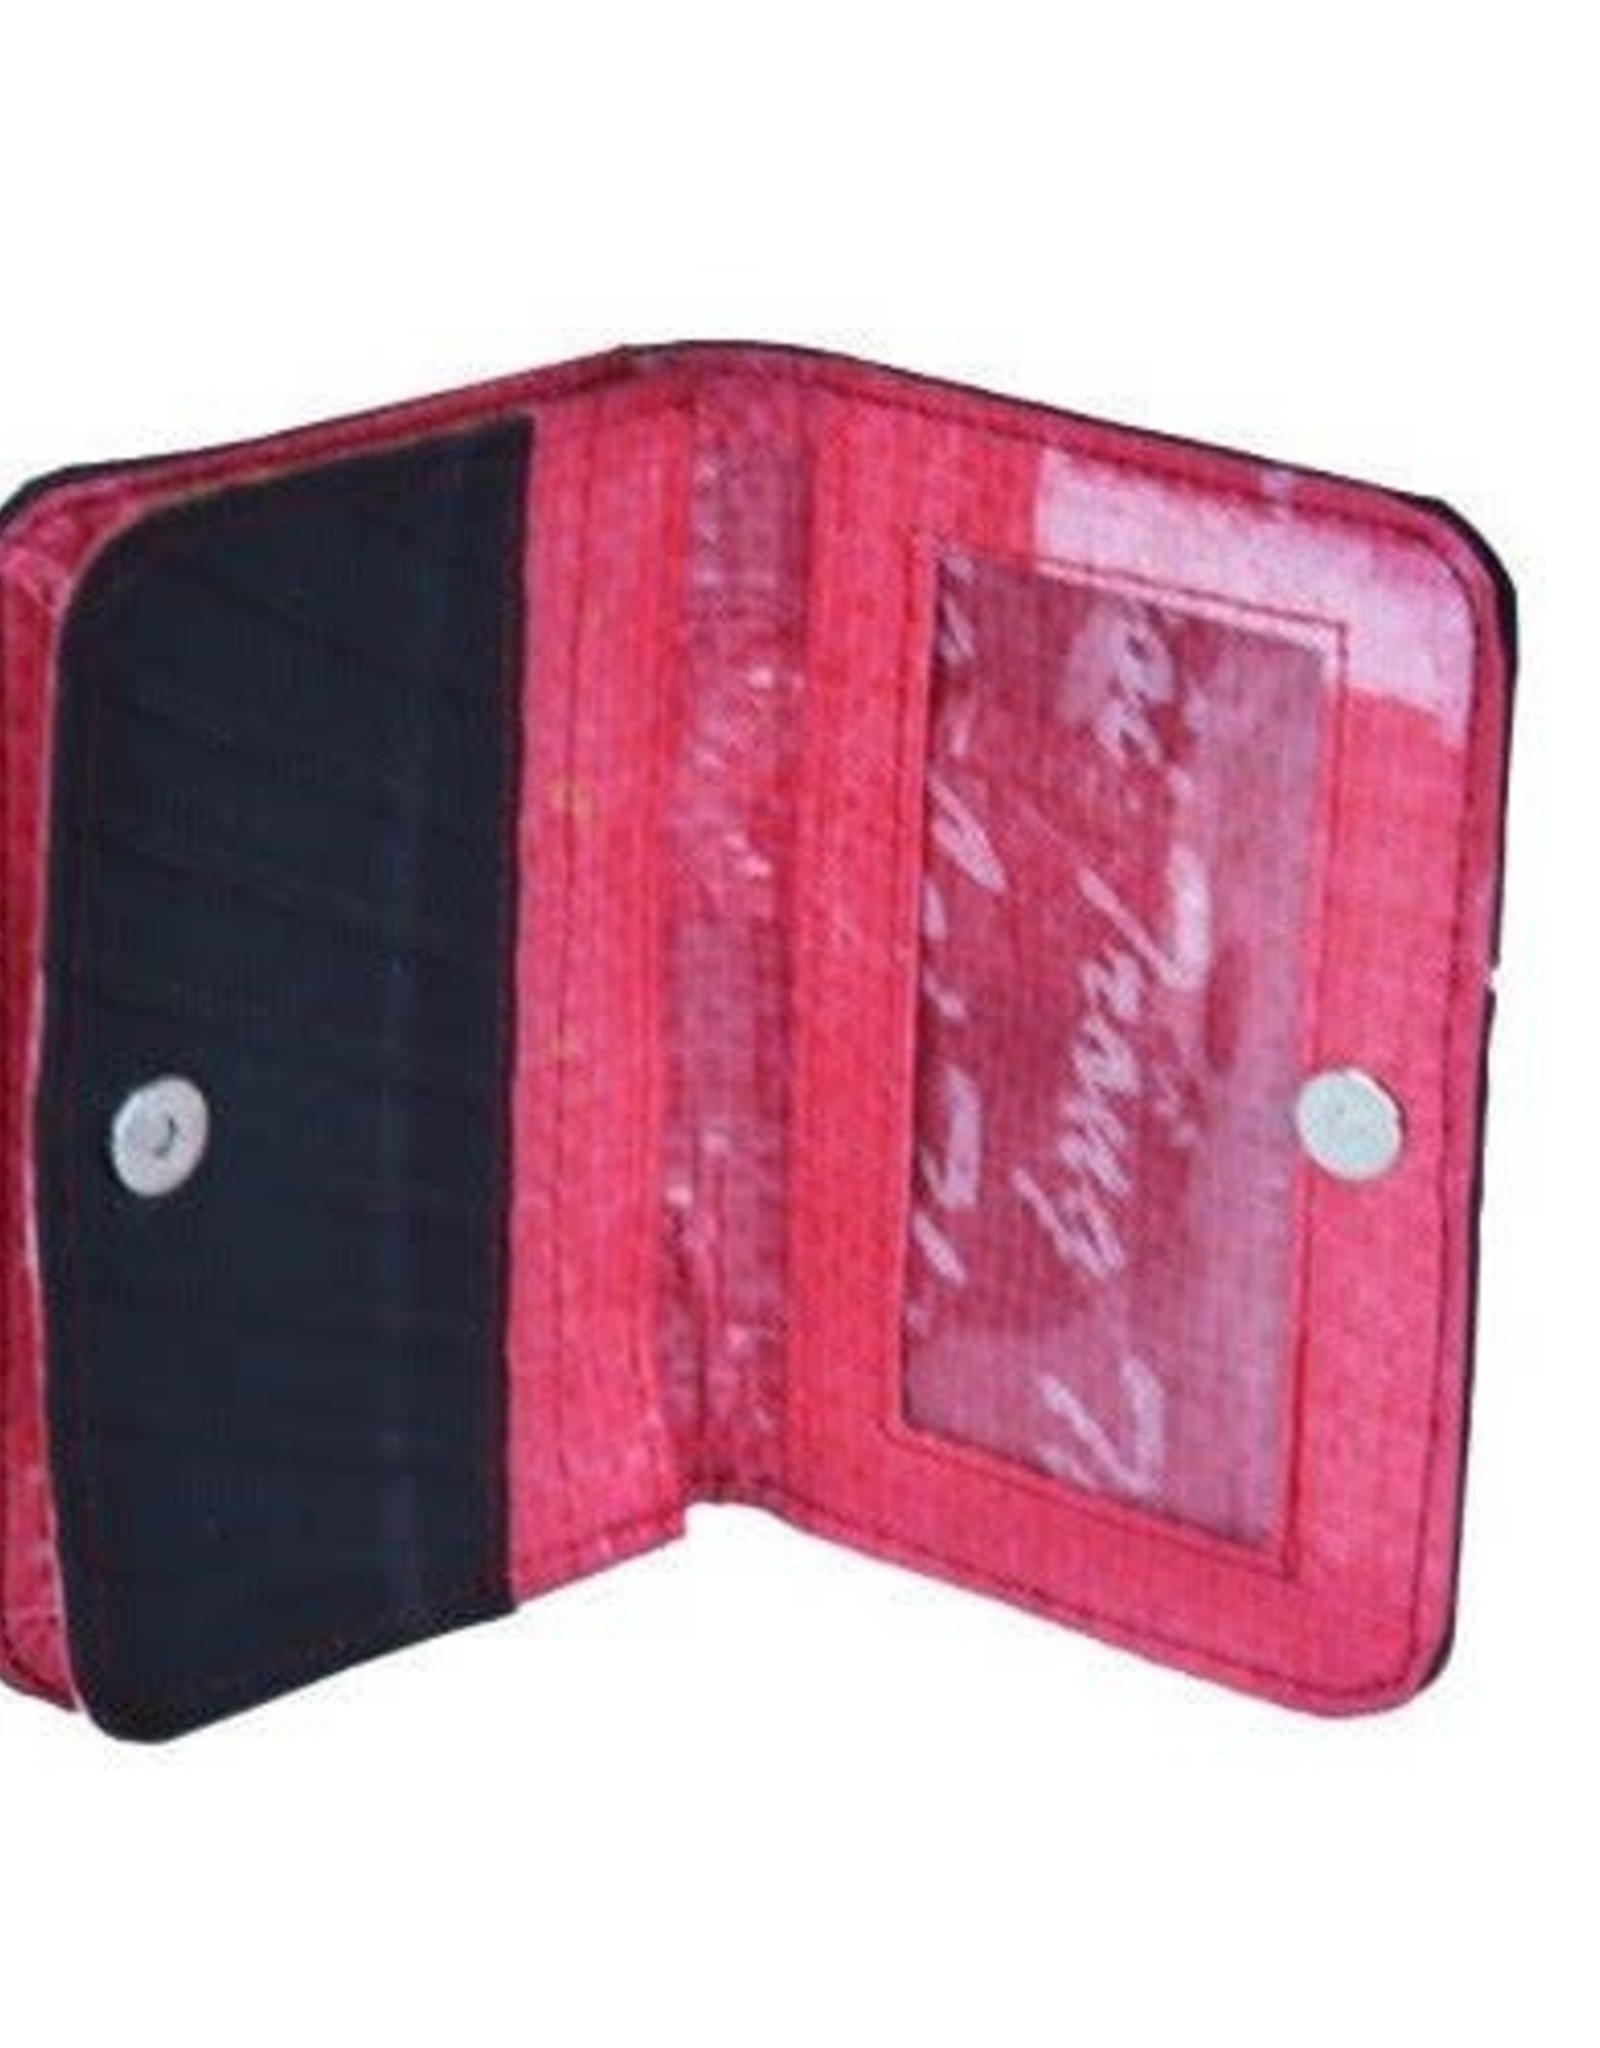 Tire Cardholder